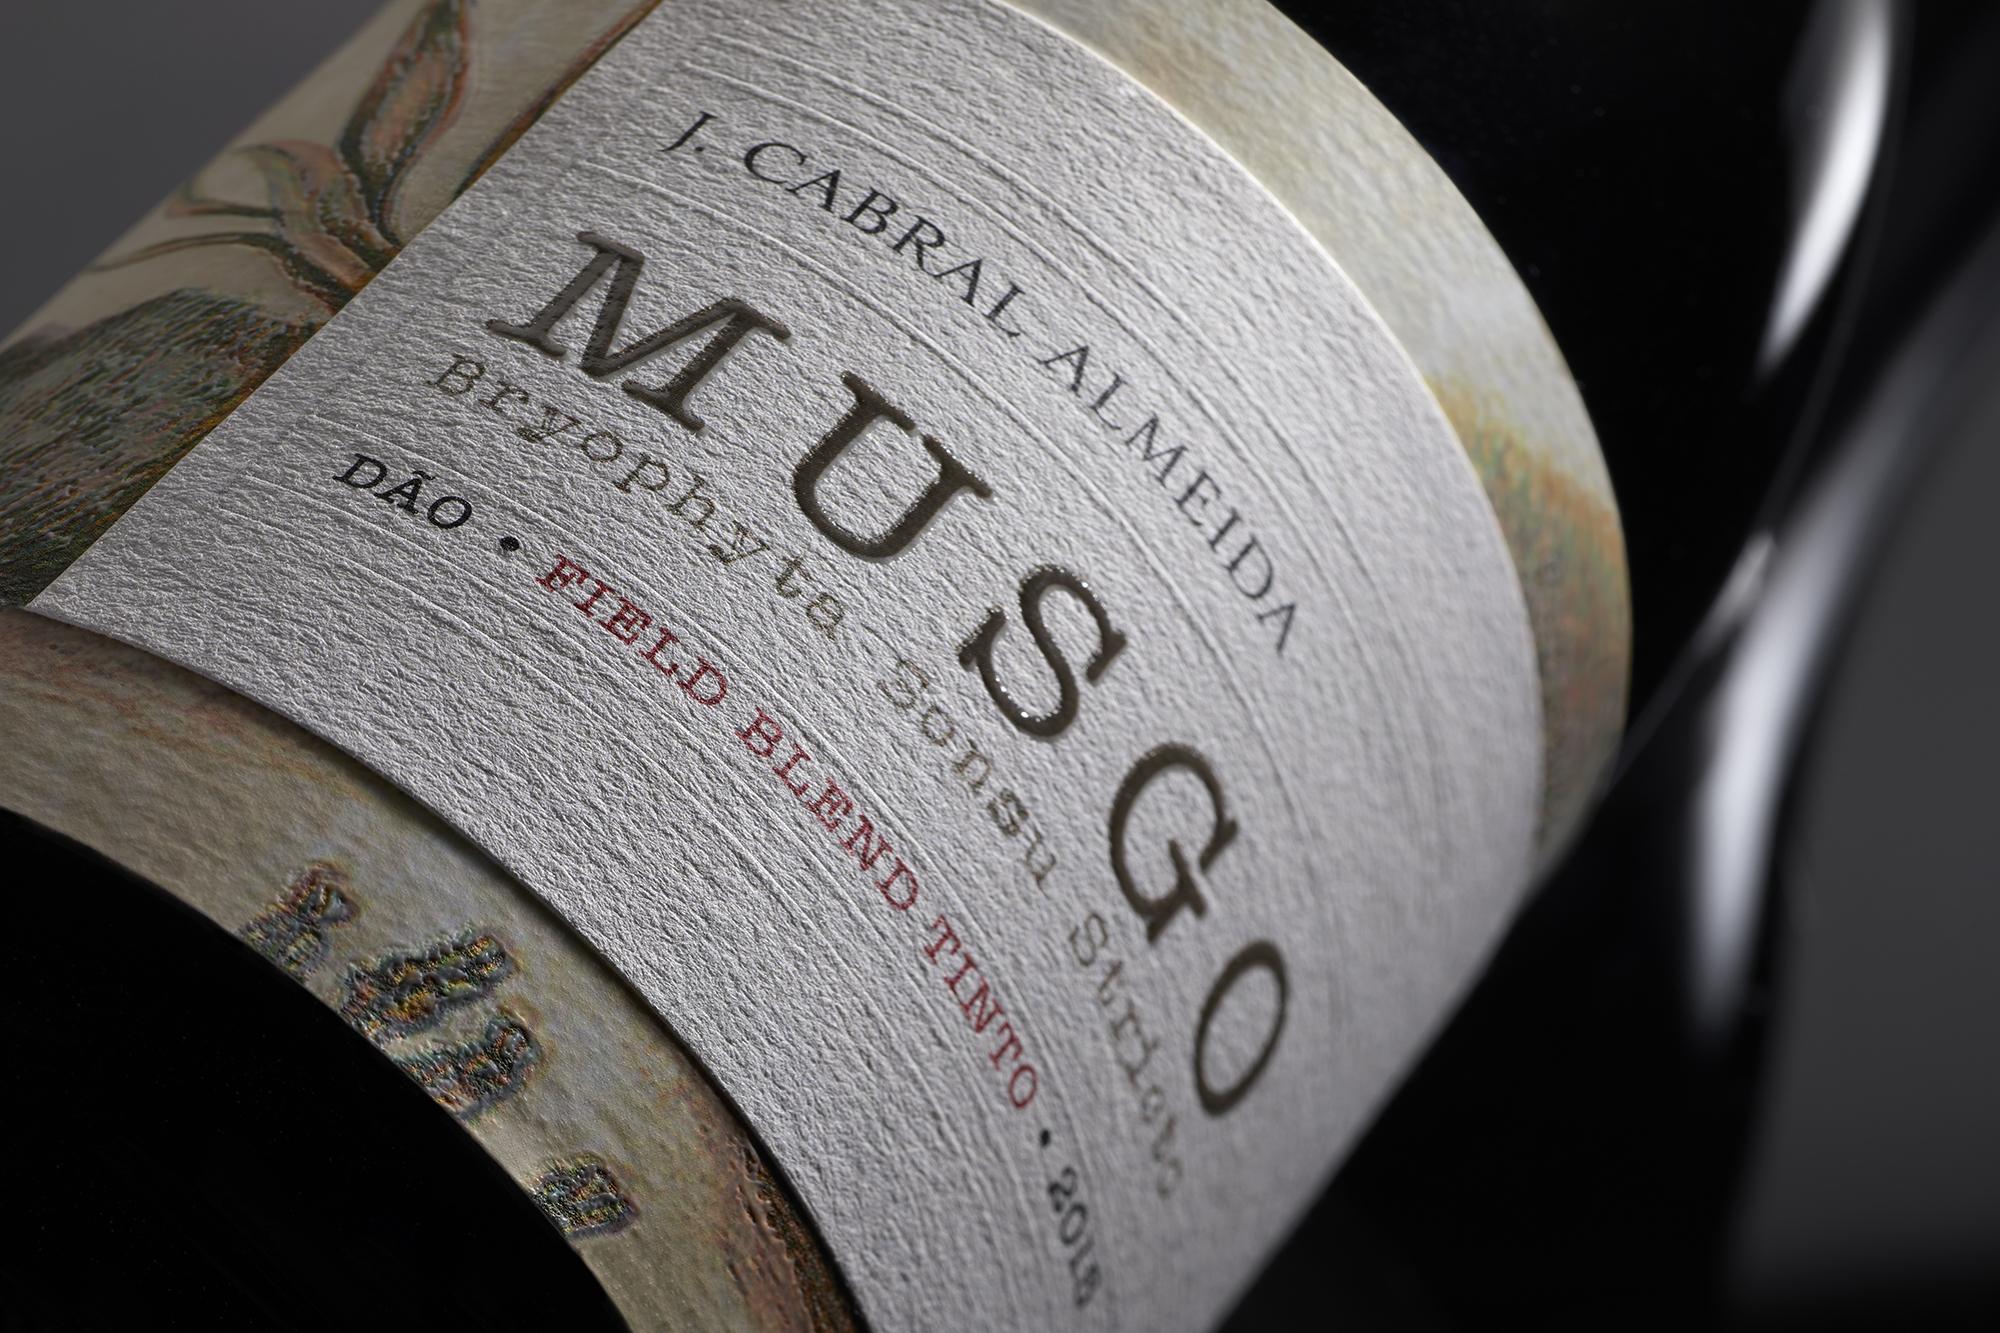 Musgo Wines Designed by Omdesign